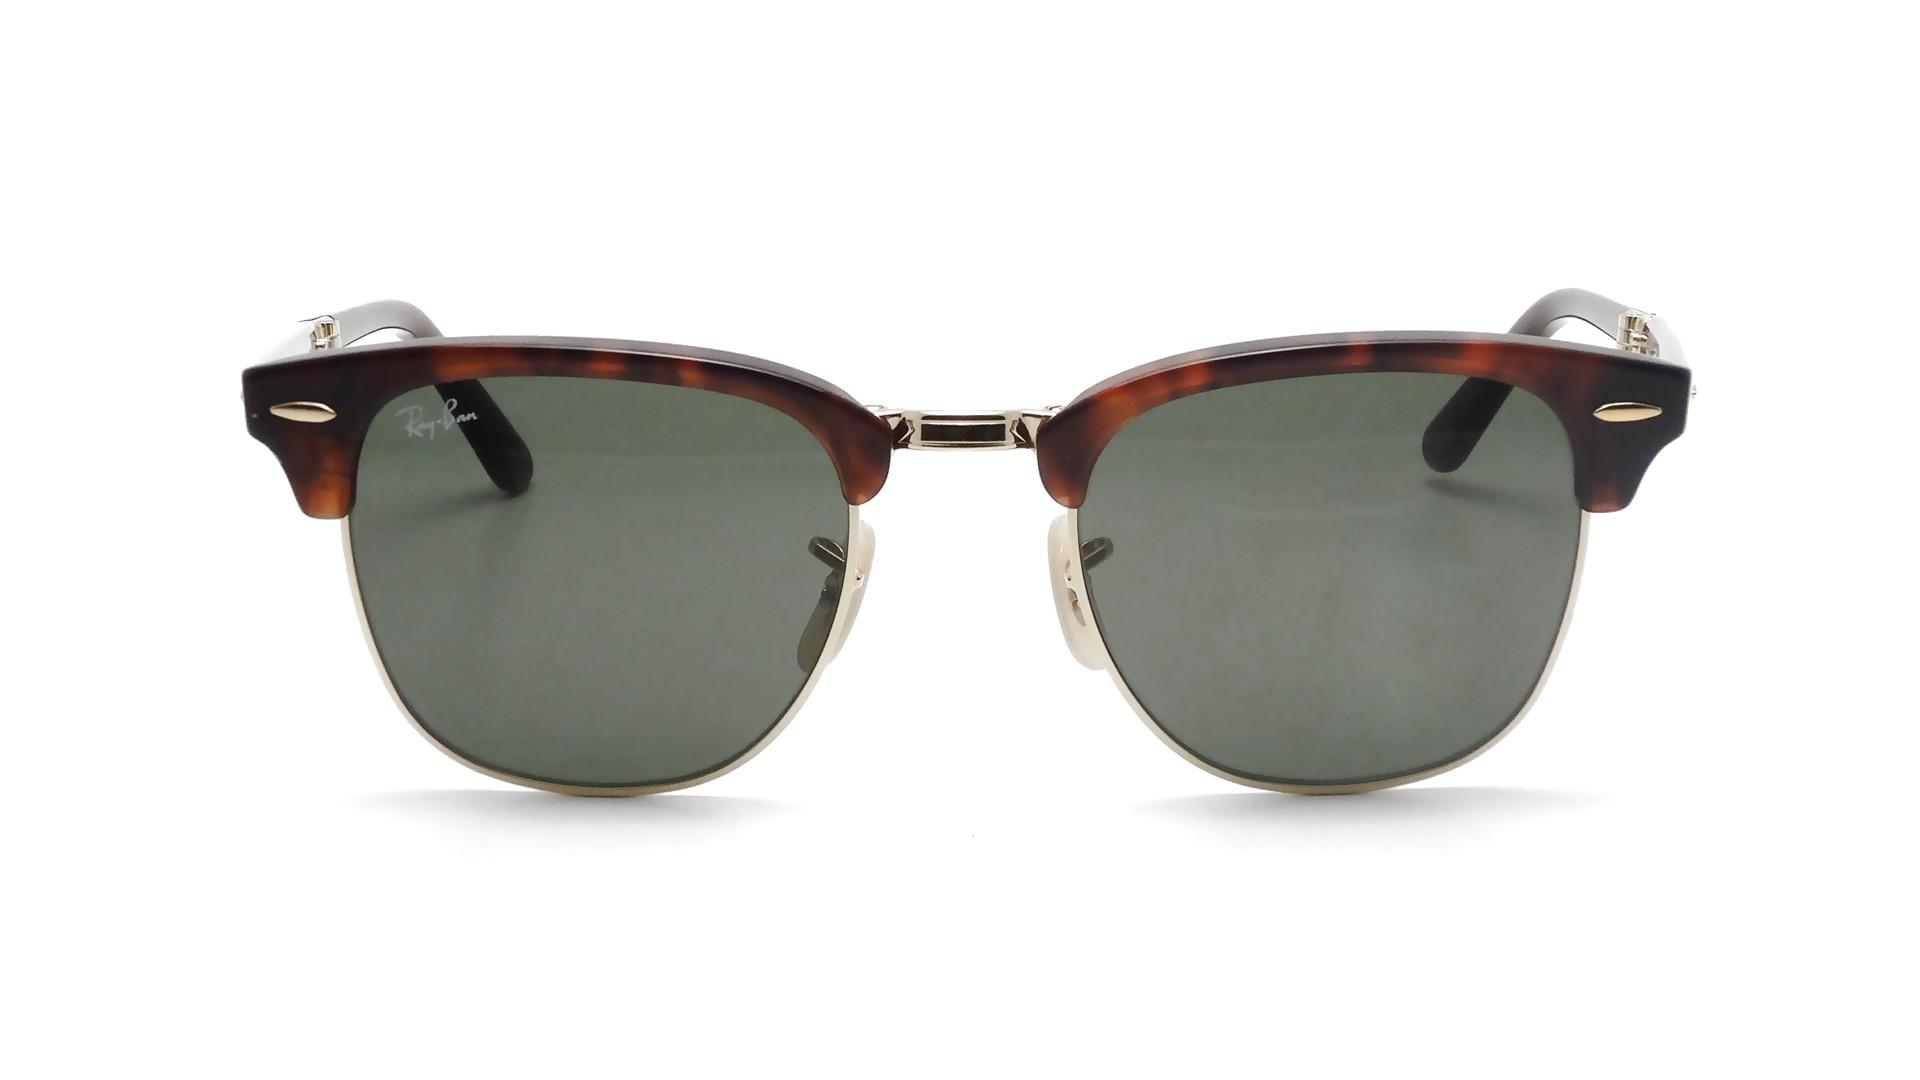 0ddcb80a7a4 Sunglasses Ray-Ban Clubmaster Folding RB2176 990 51-21 Havana Medium Folding